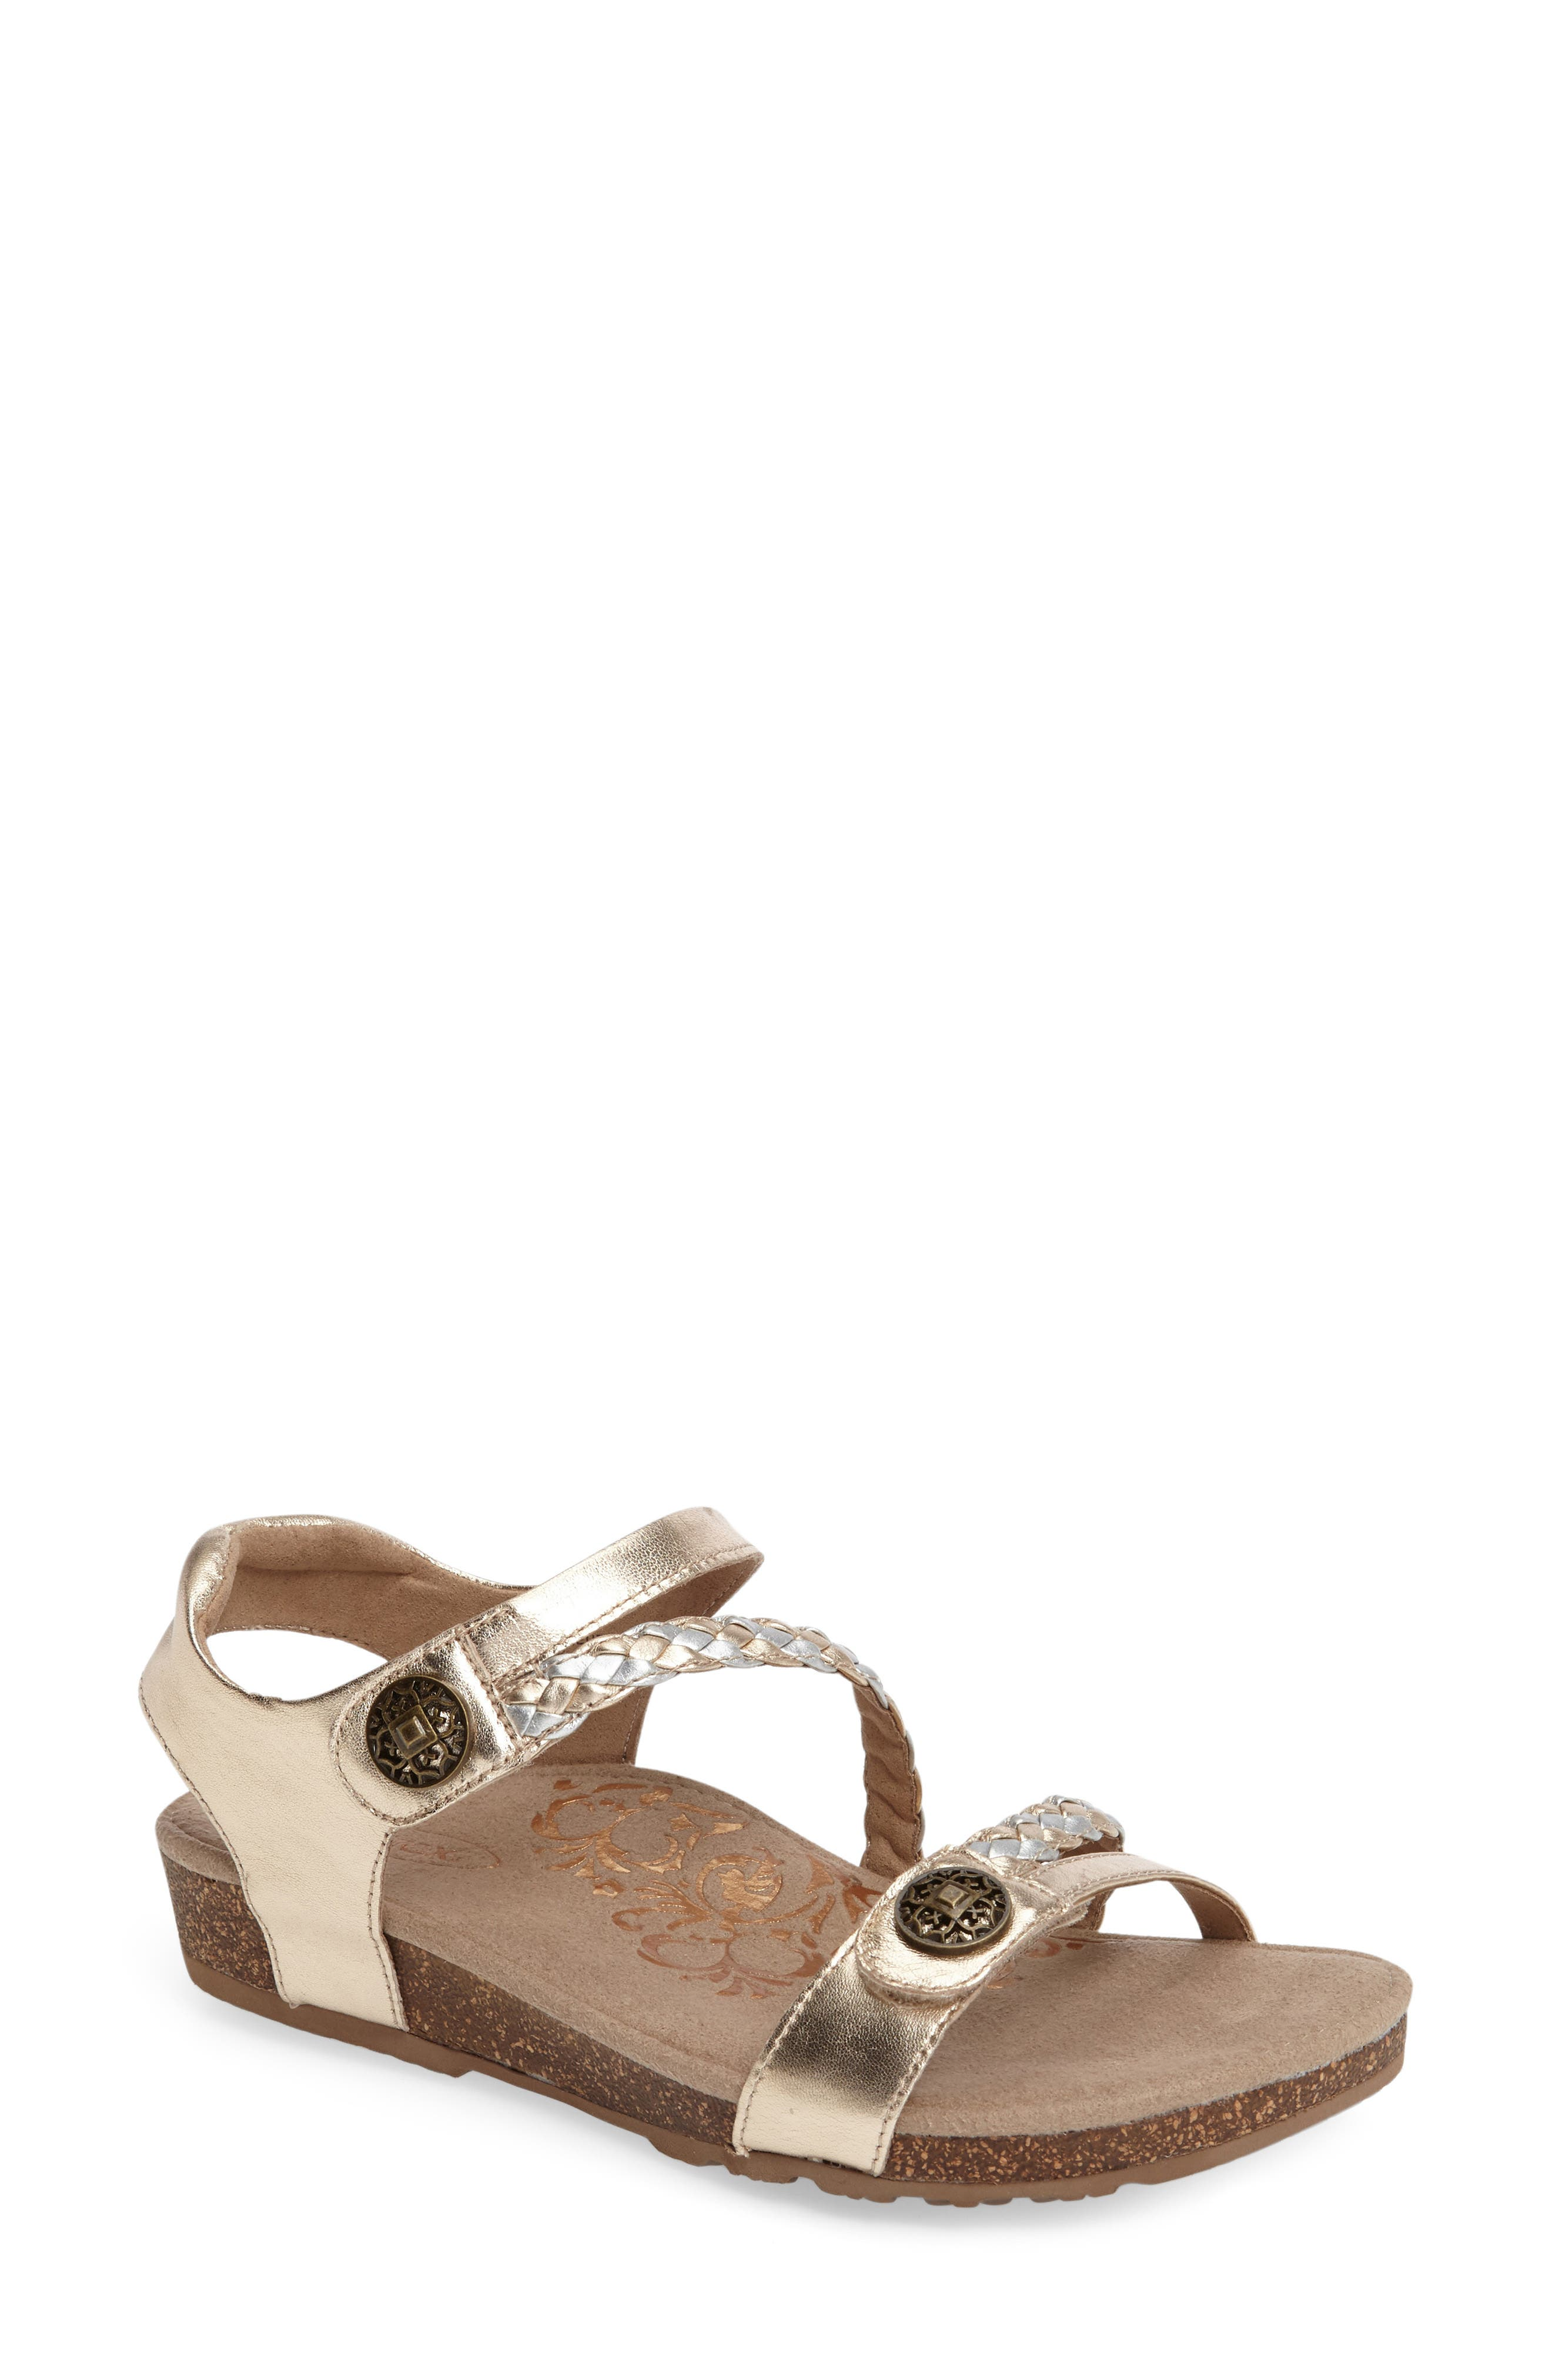 Main Image - Aetrex 'Jillian' Braided Leather Strap Sandal (Women)